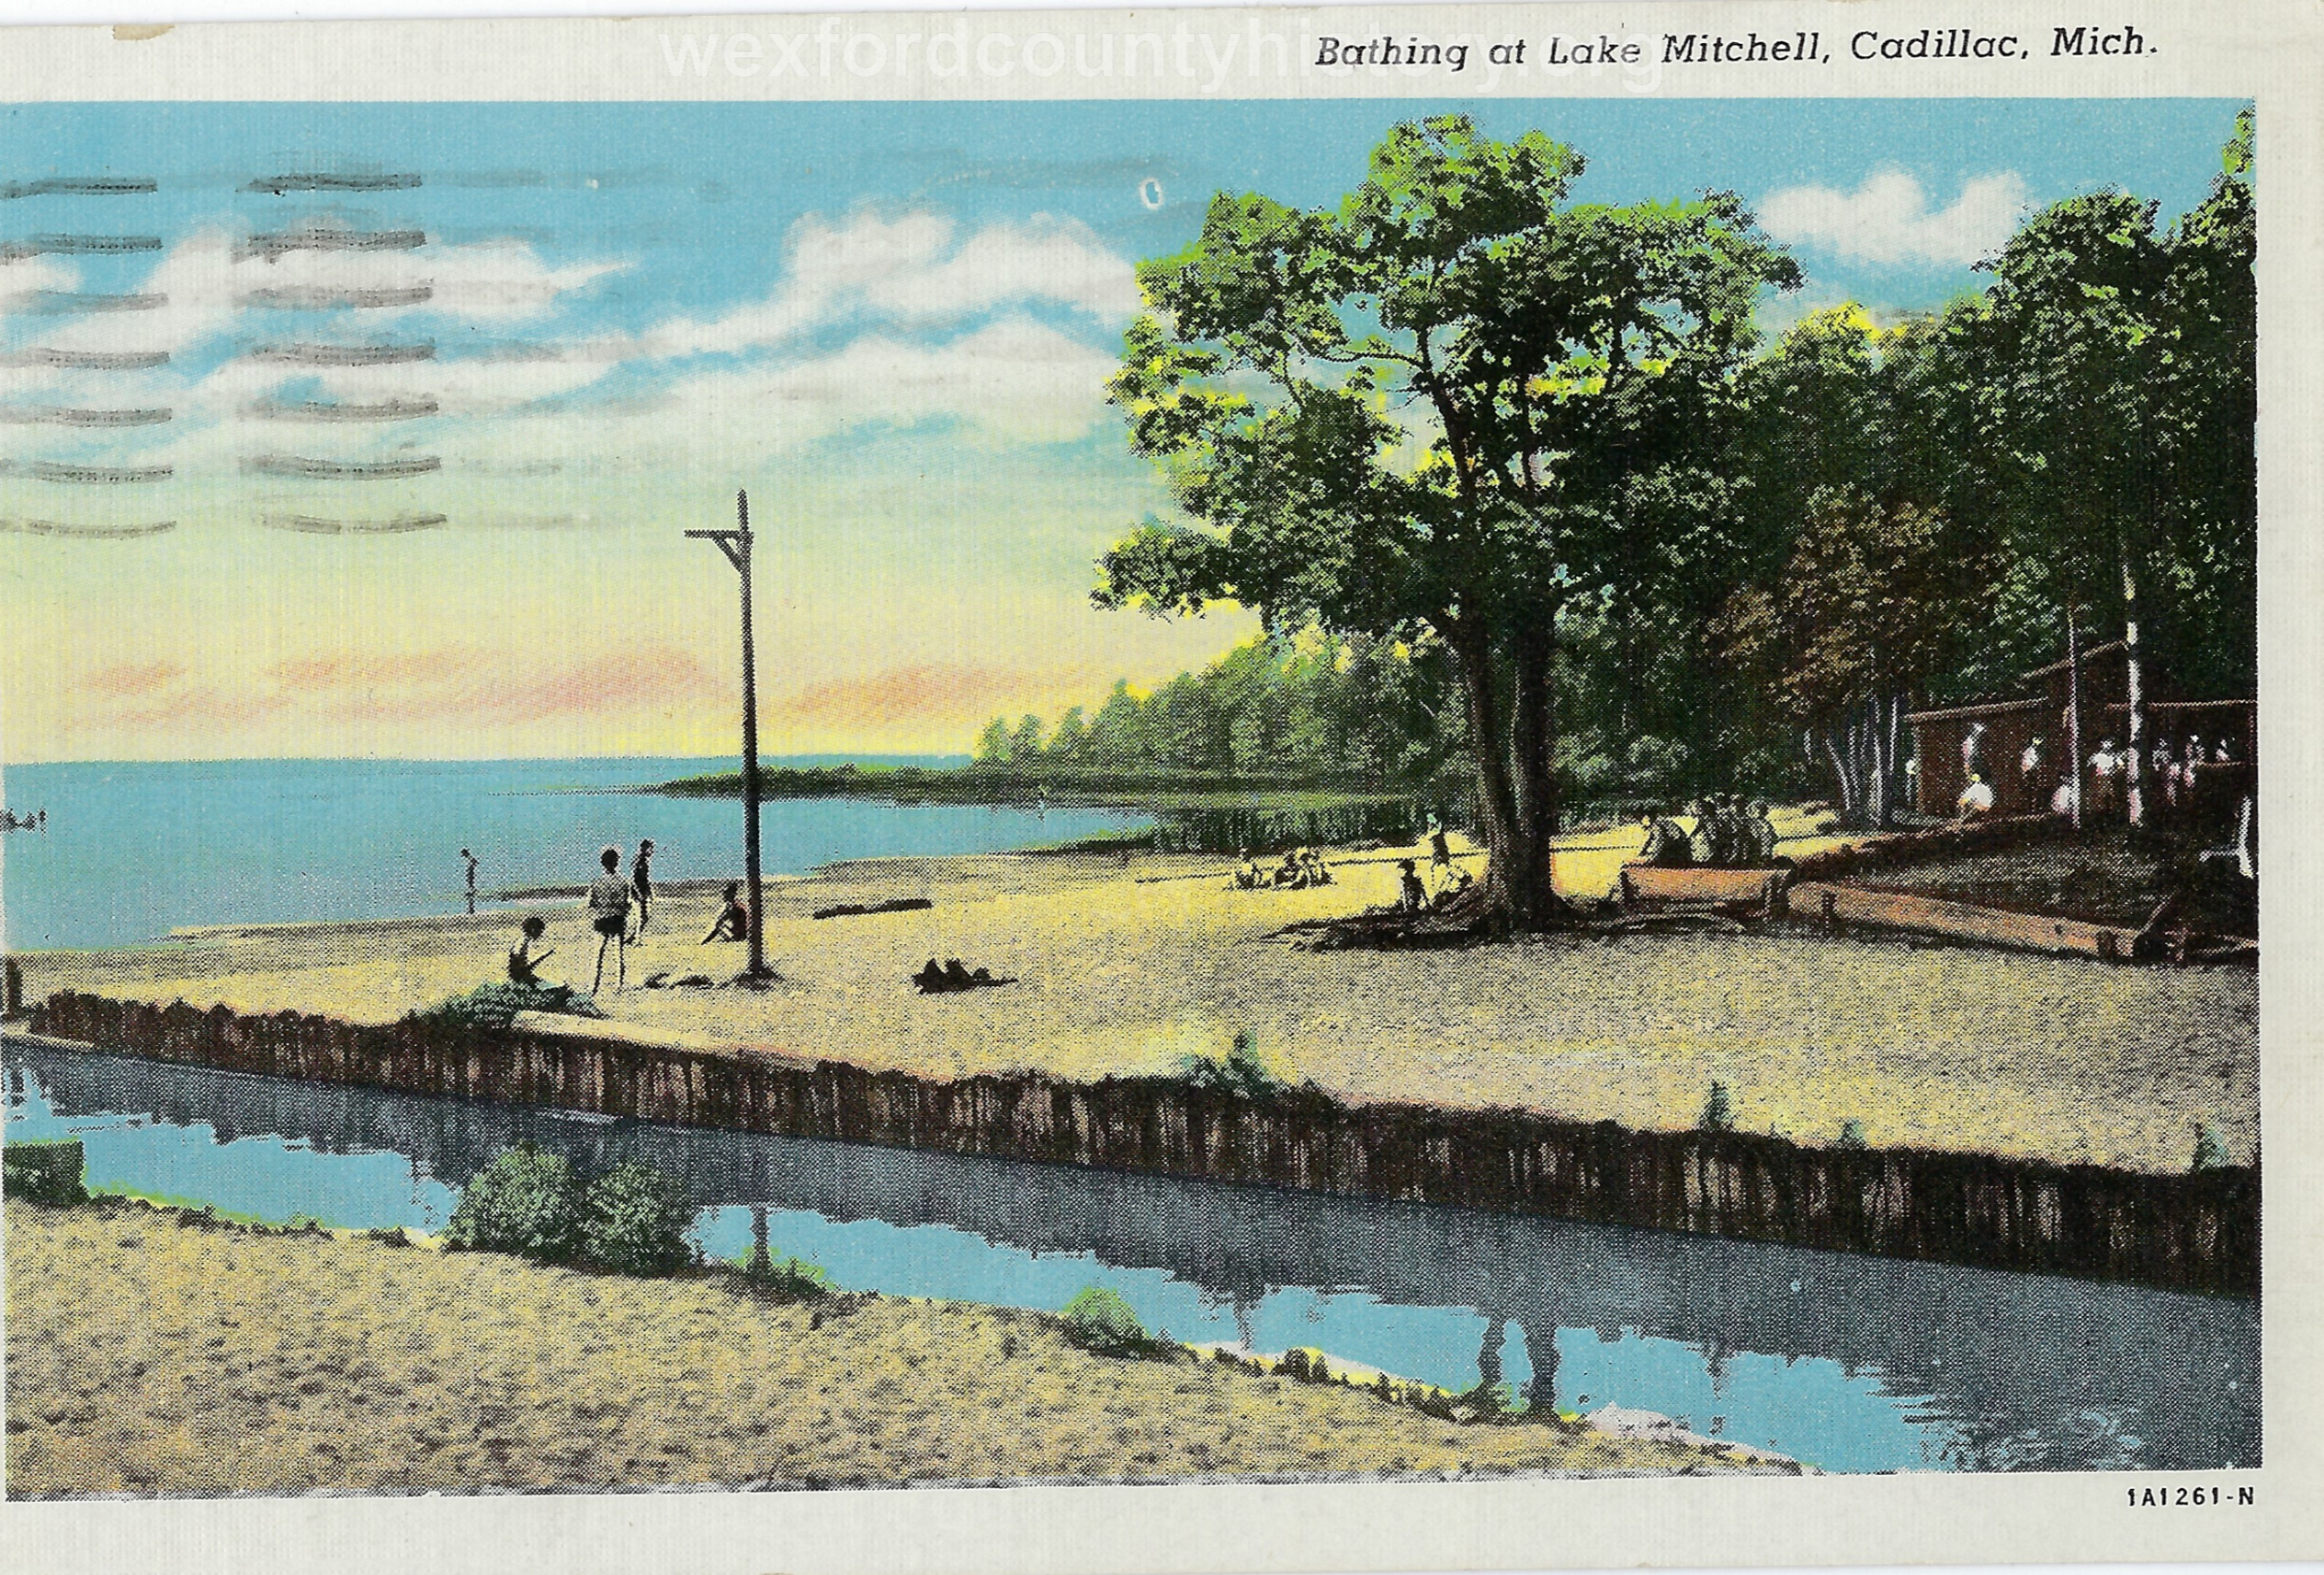 Cadillac-Recreation-Lake-Mitchell-12